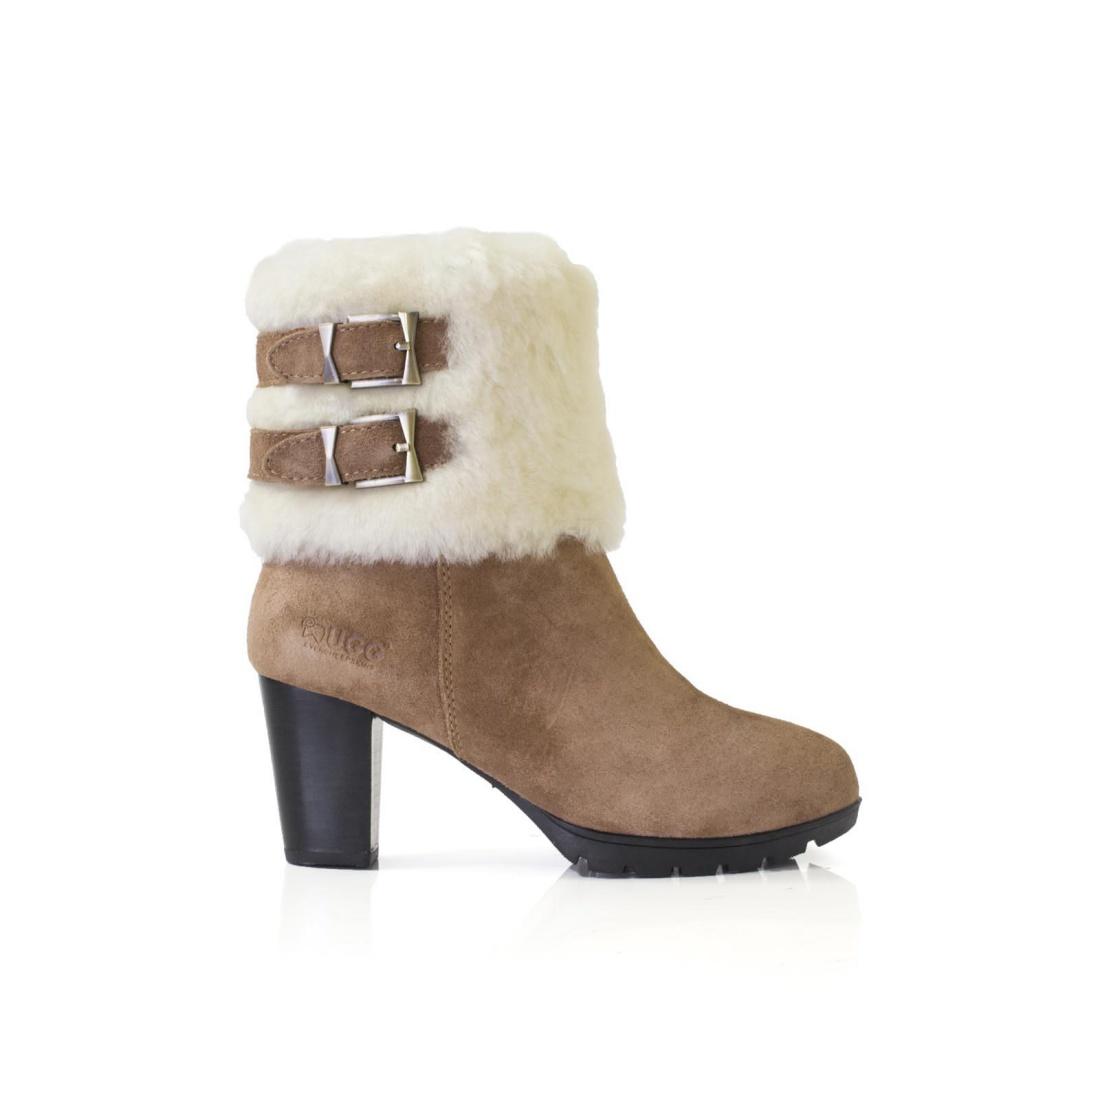 UGG High Heel Boots - Chestnut - AU Women 5 / Men 3